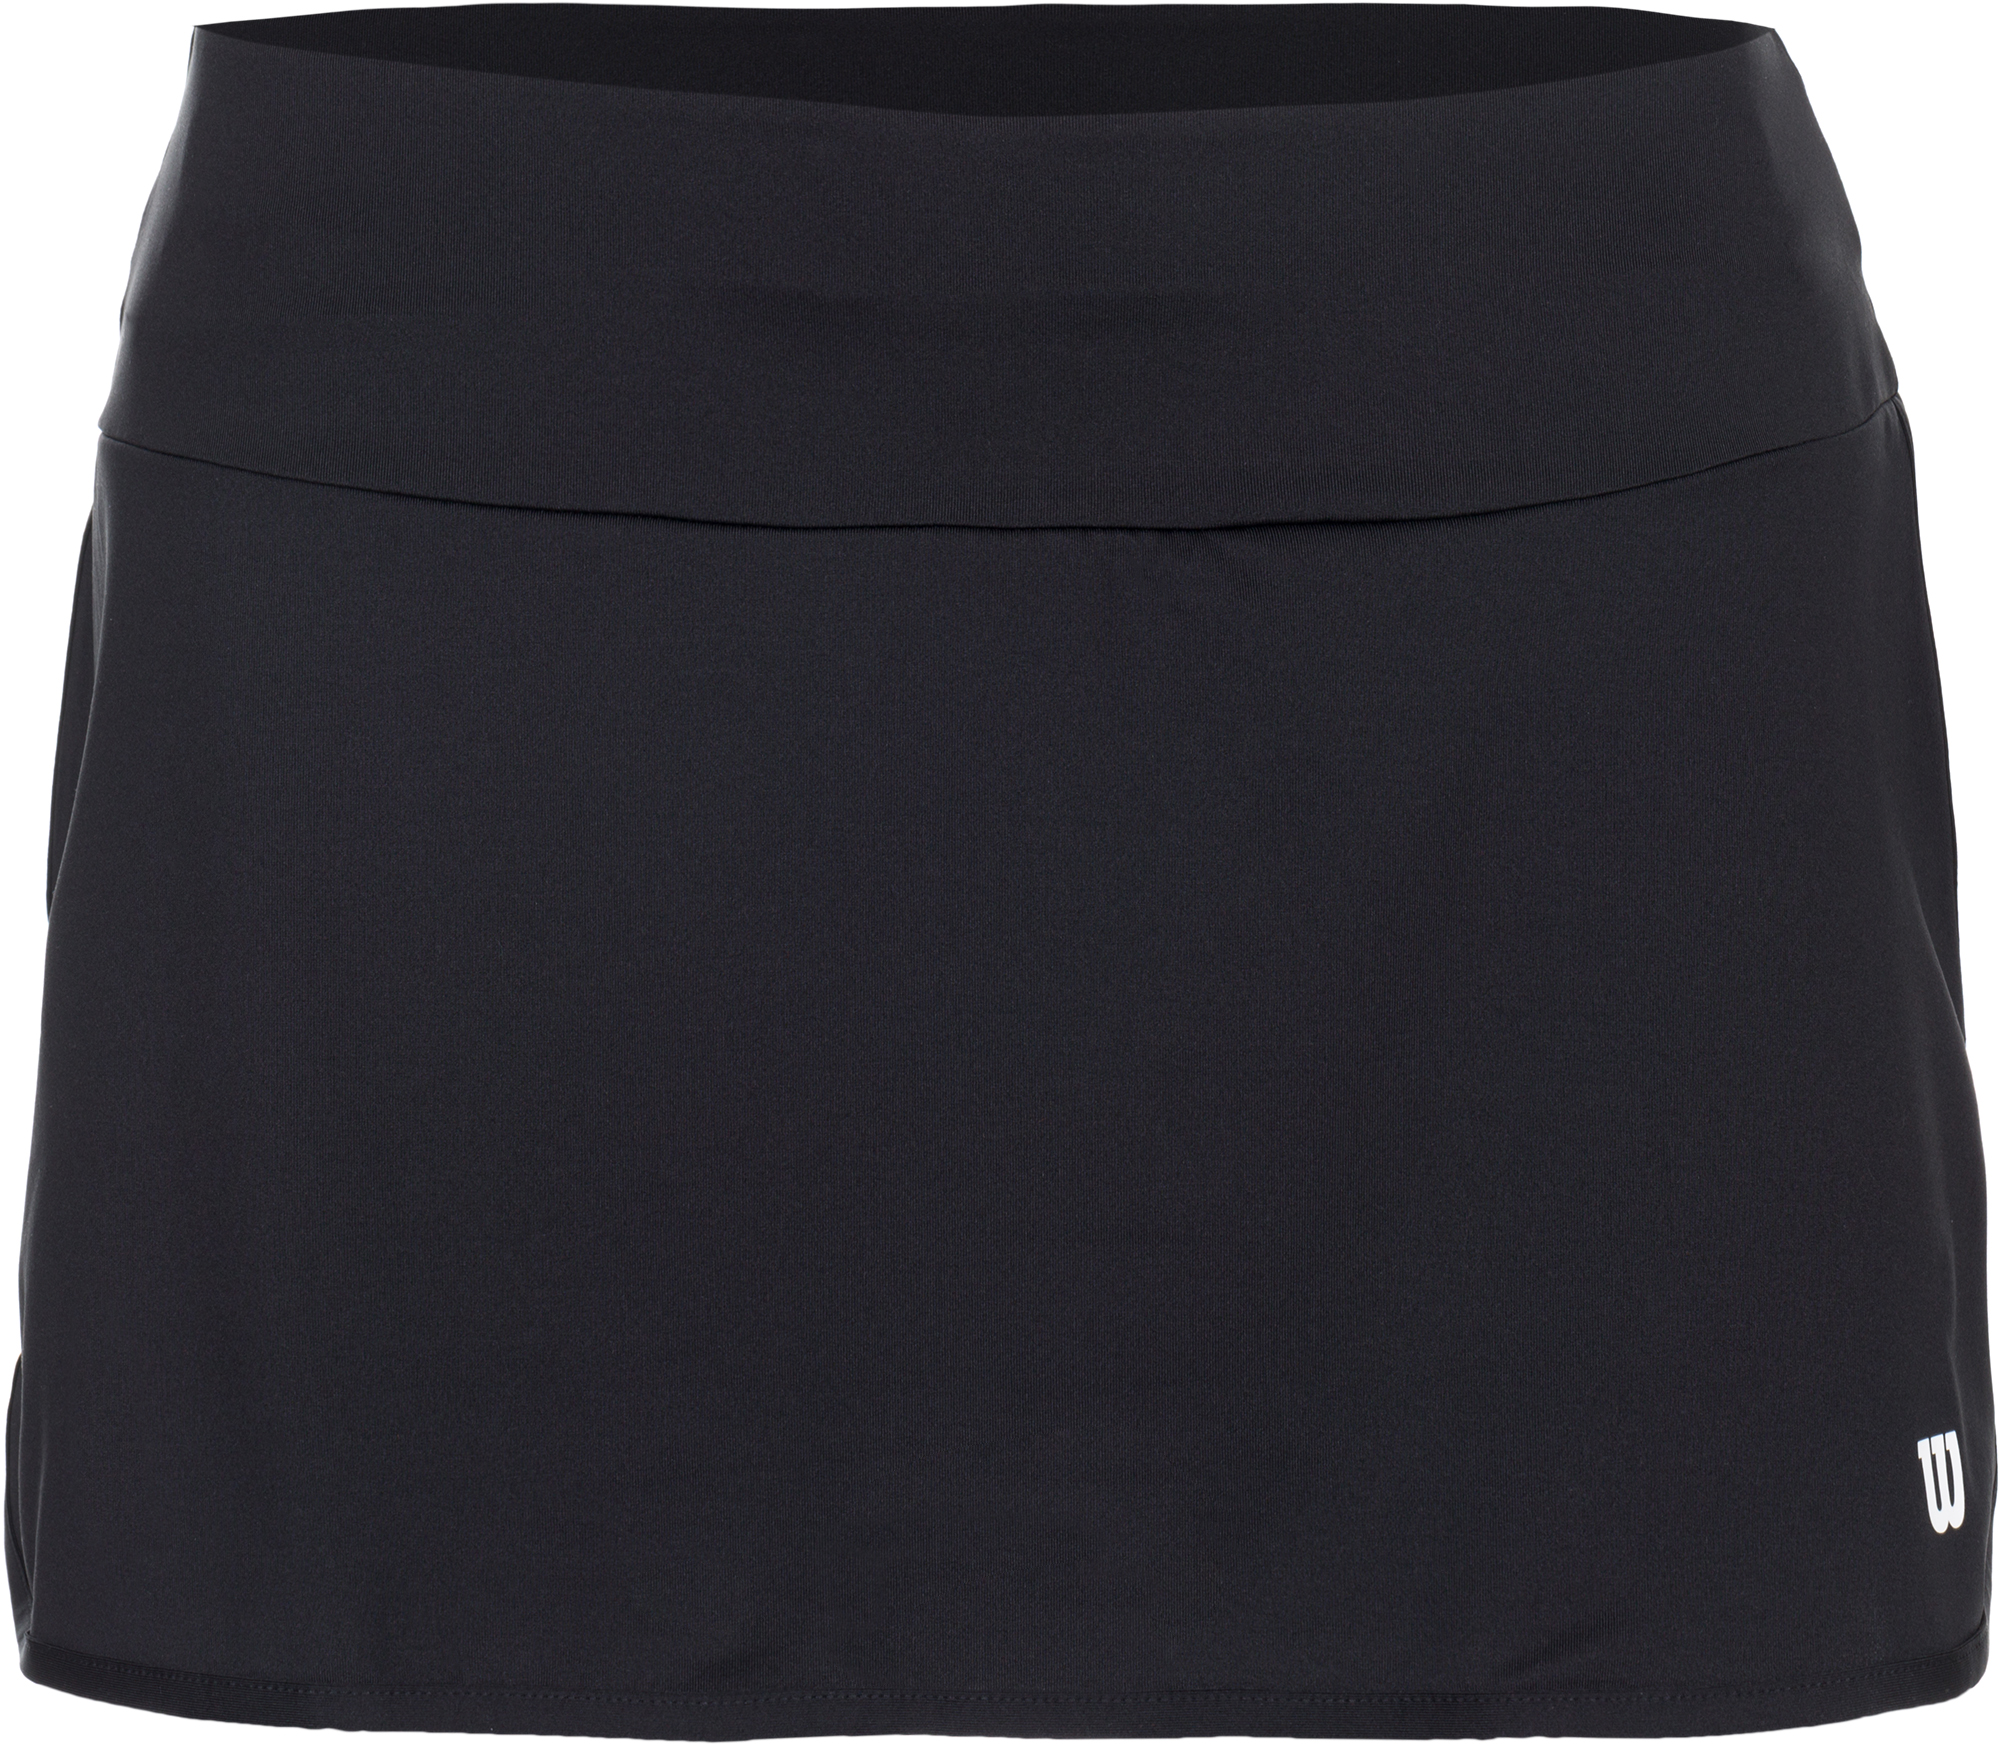 Wilson Юбка-шорты женская WilsonTeam, размер 36-38